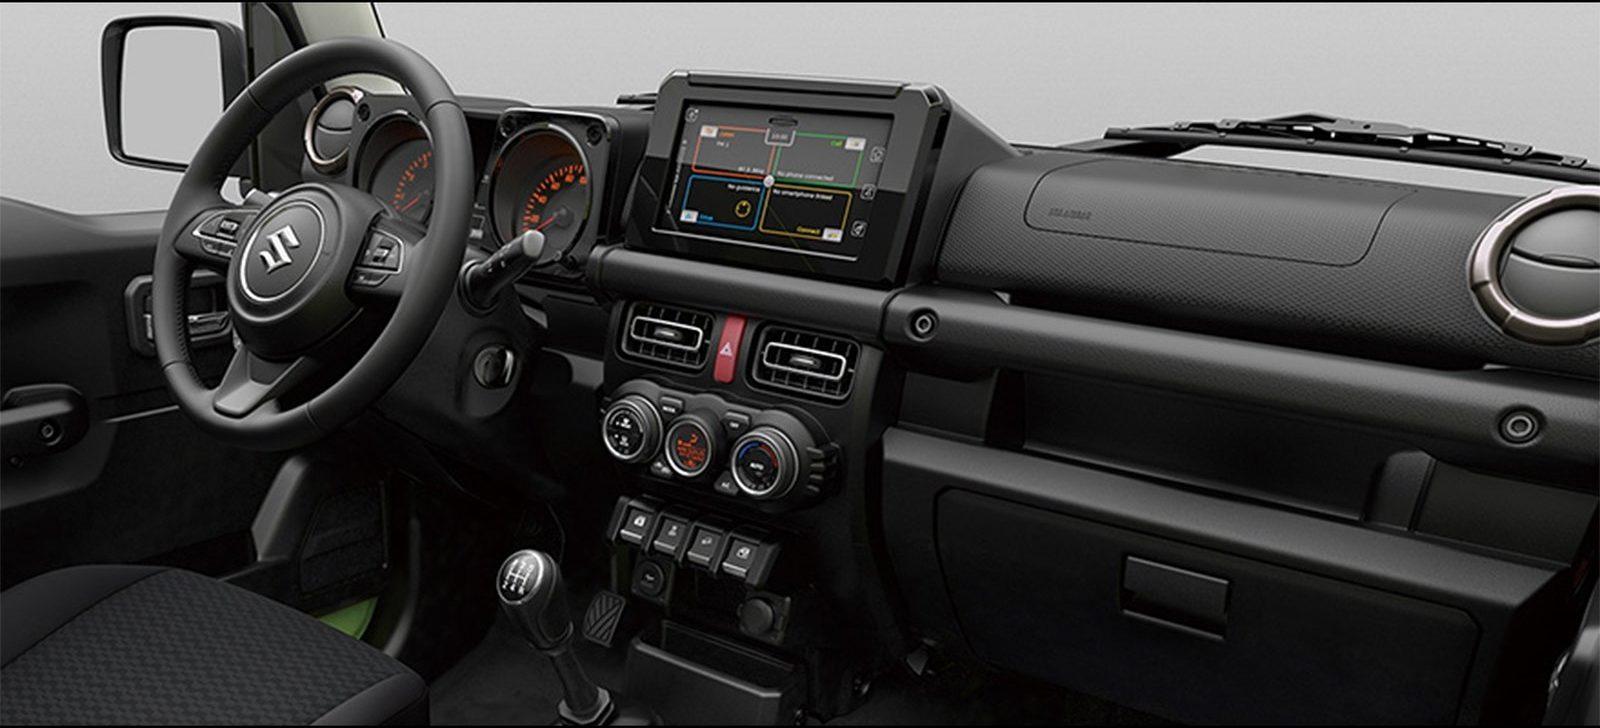 Suzuki-Jimny-2019-1600-06